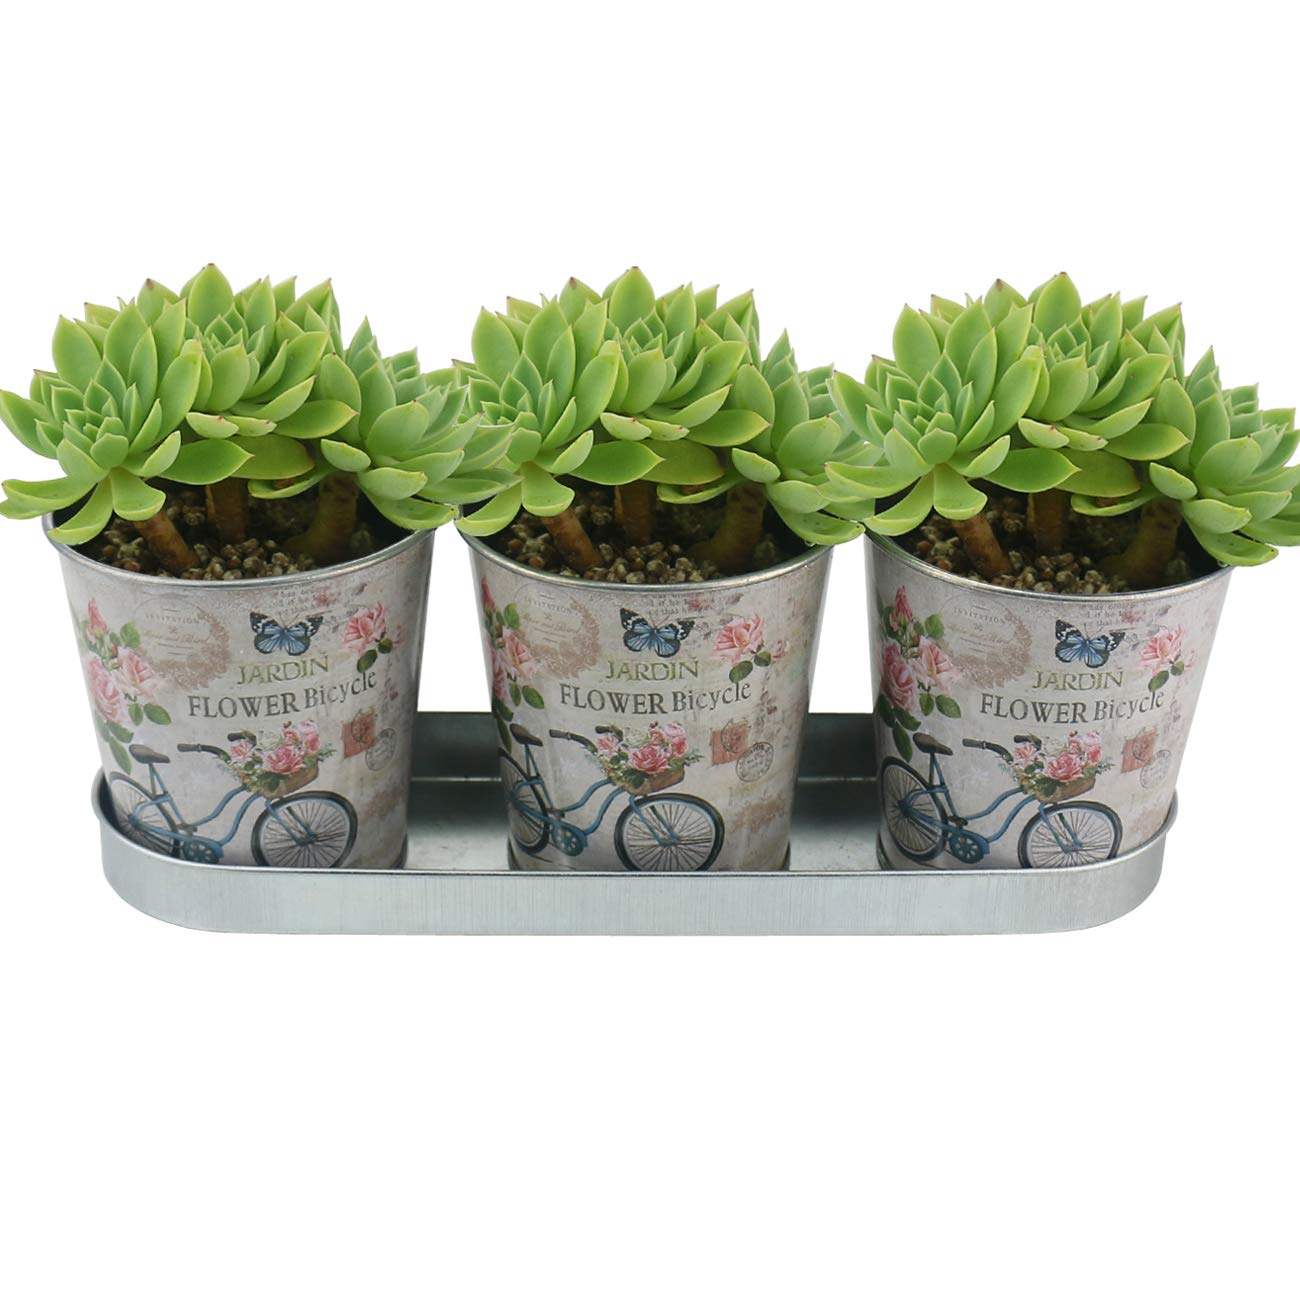 "Ogrmar 3 Buckets 3.9"" Silverware Picnic Caddy/Succulent Planter Metal Pots/Silverware Flatware Caddy Organizer/Farmhouse Decor/Office supplies study article organizer with Tray (Bicycle L)"